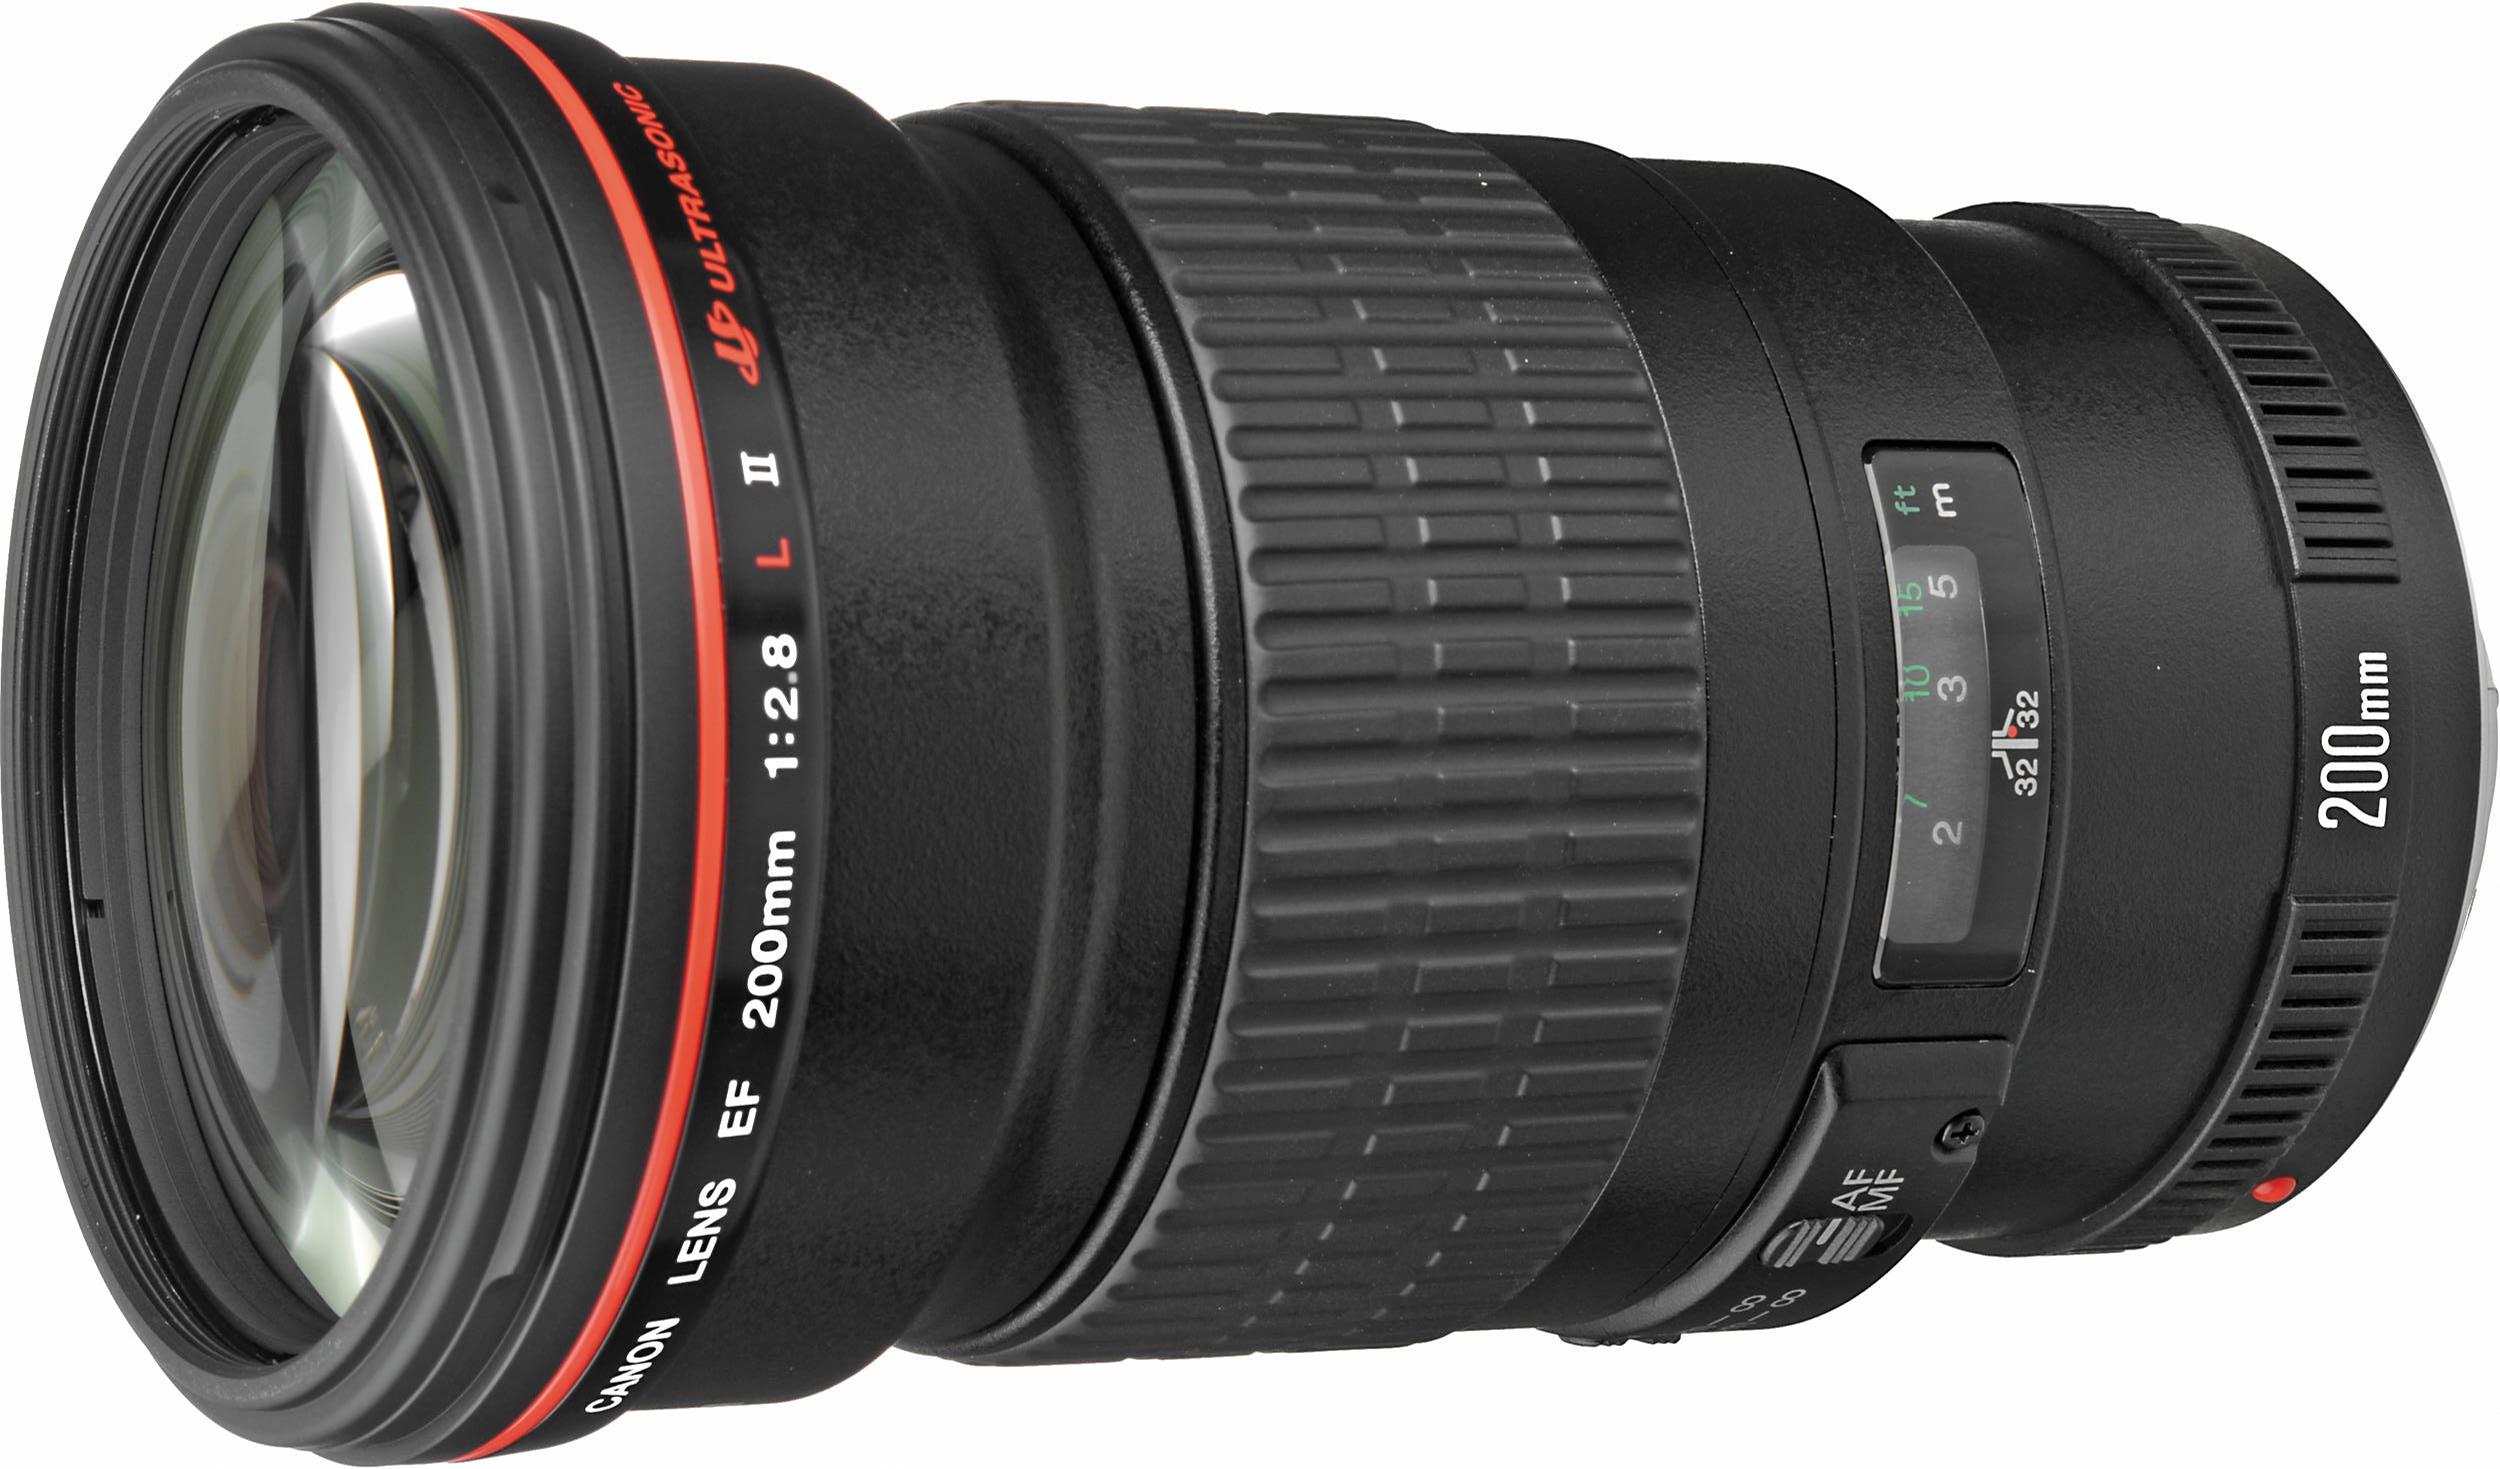 Top 10 Lenses for Shooting Pro-Caliber Portraits